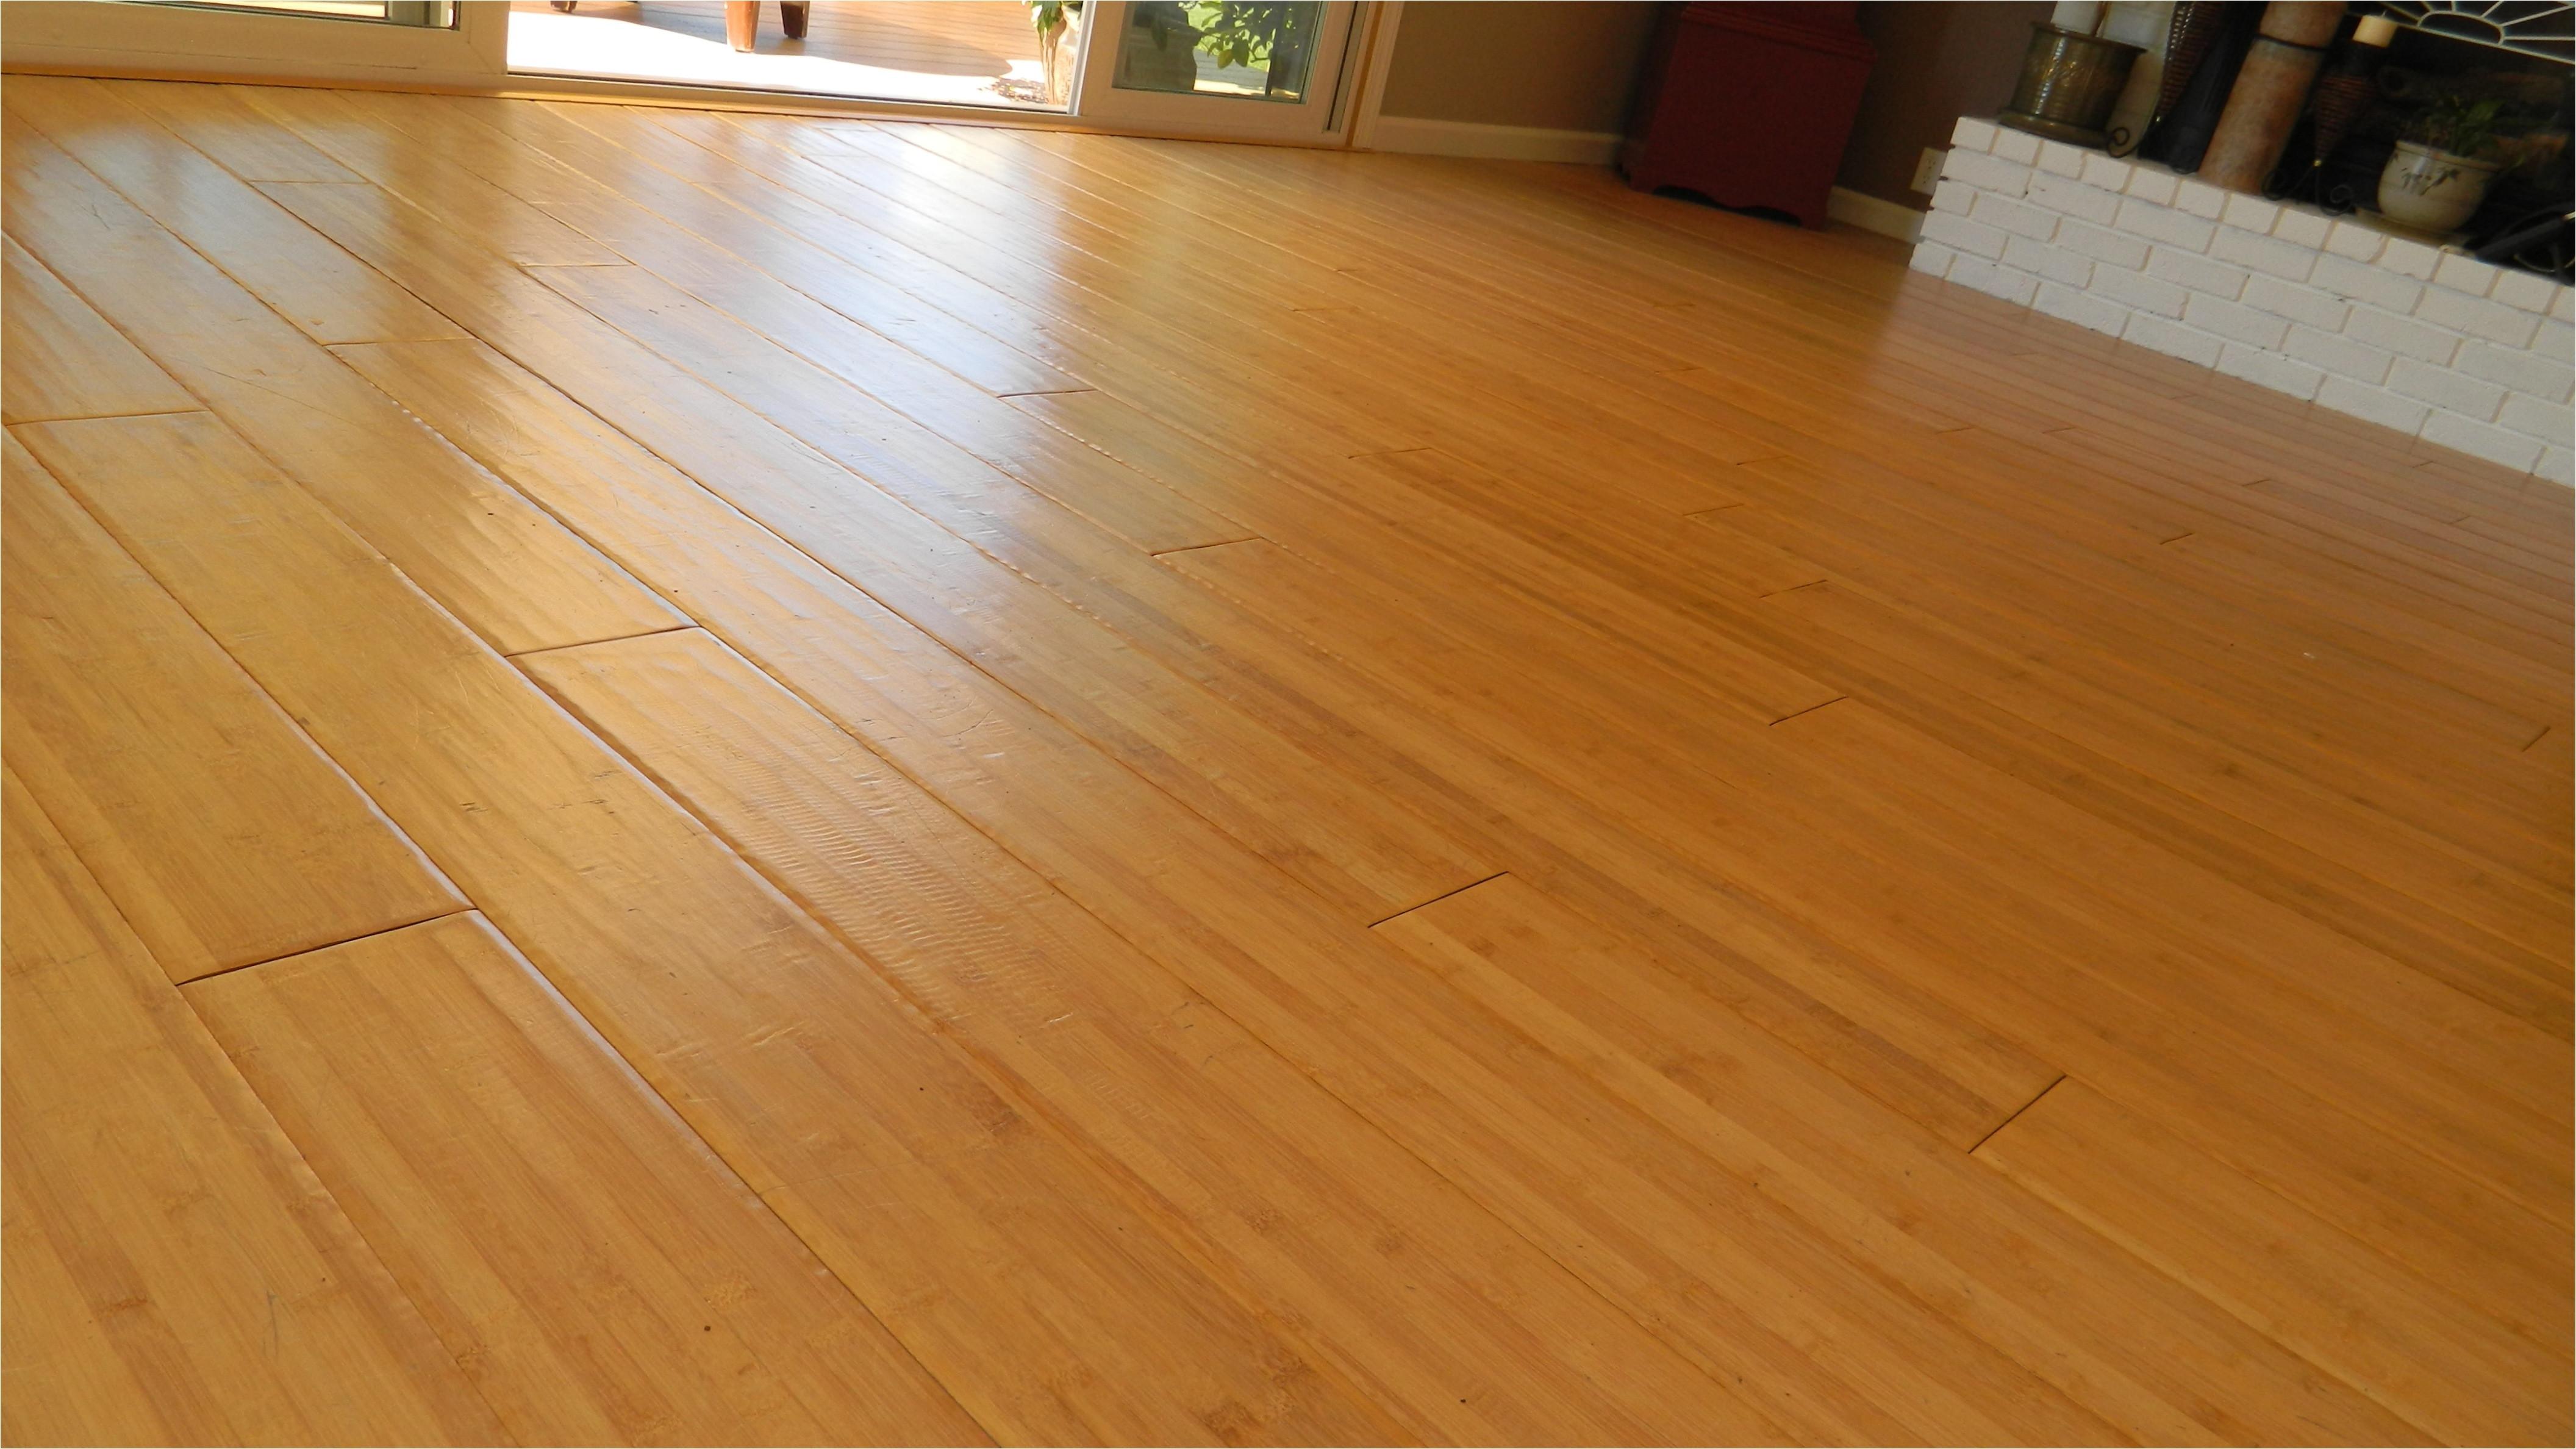 bamboo vs engineered hardwood flooring of 37 best unfinished bamboo floor stock flooring design ideas throughout unfinished bamboo floor beautiful shark steam mop engineered hardwood floors pics of 37 best unfinished bamboo